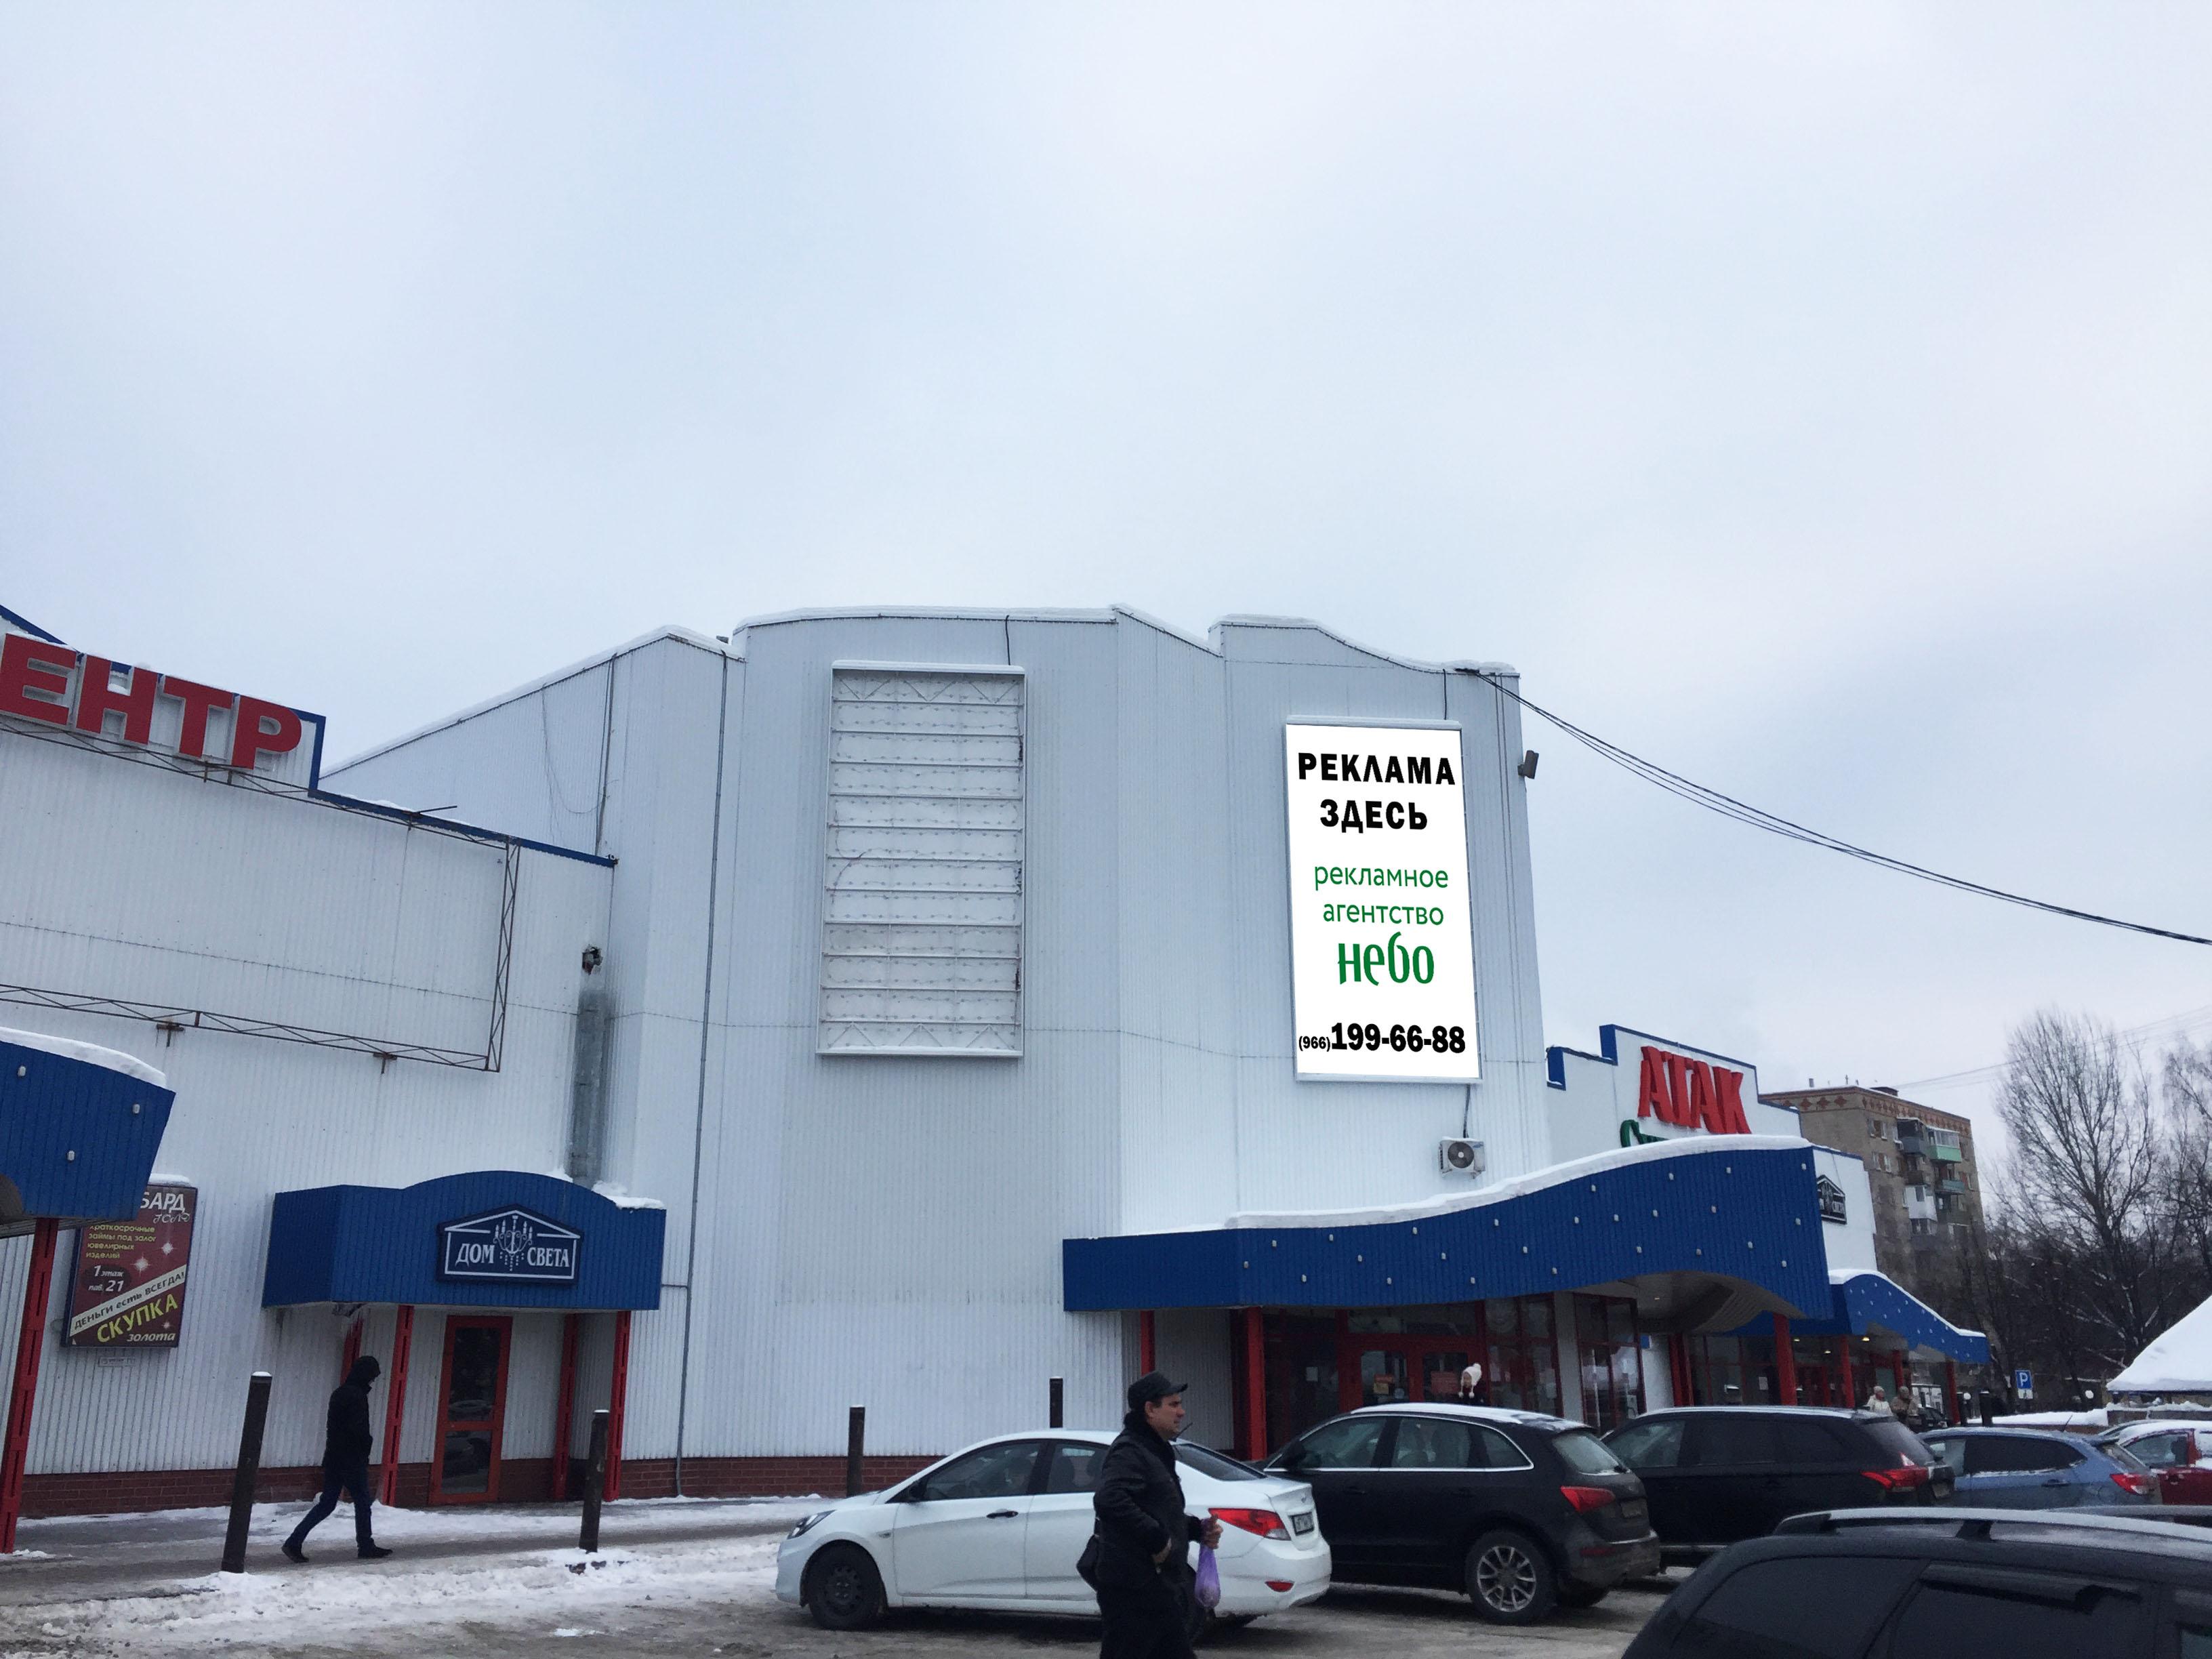 брандмауэры в подольске на фасадах зданий